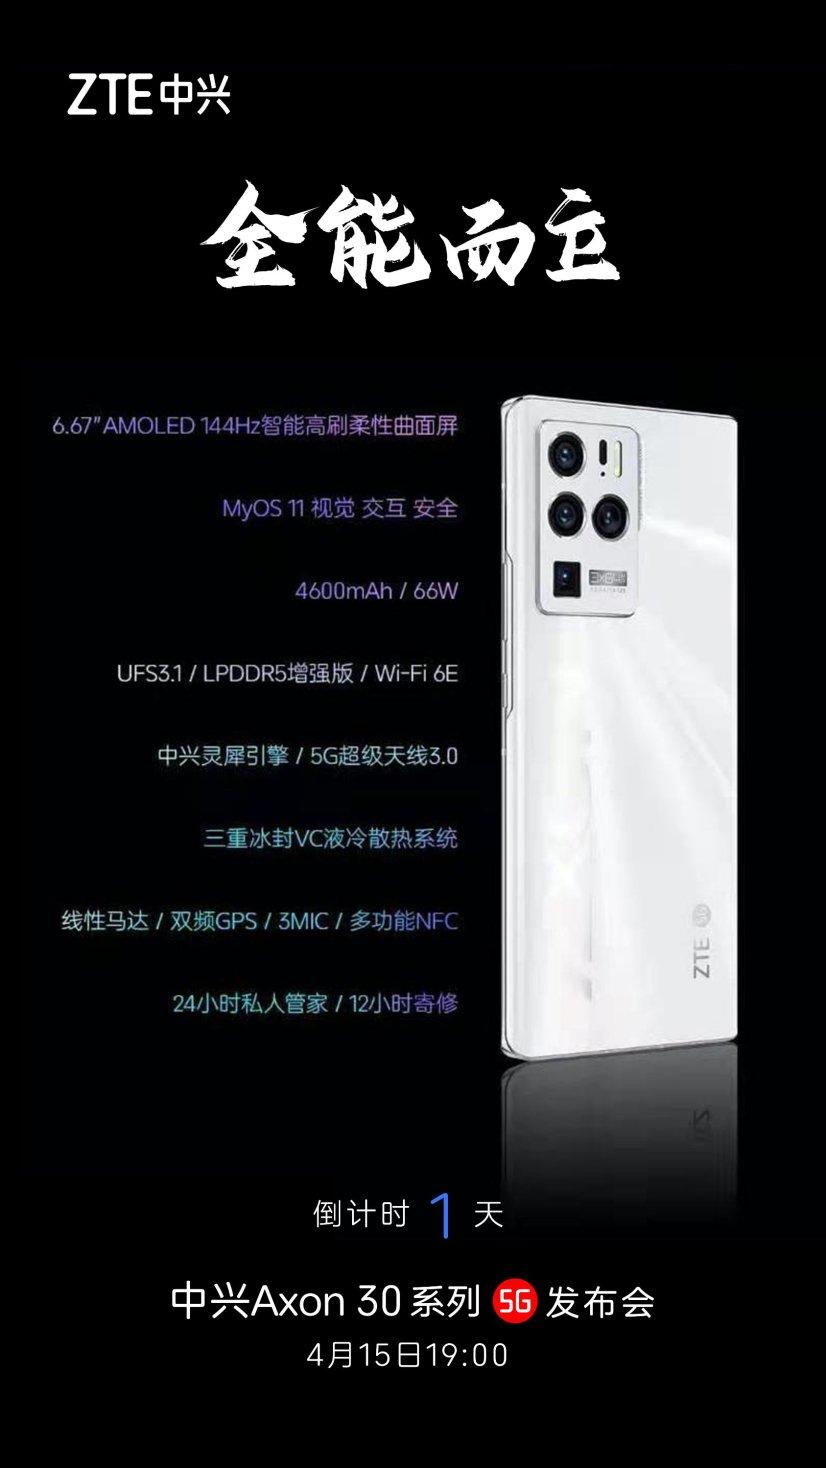 ZTE Axon30 Ultra Overview Trailer